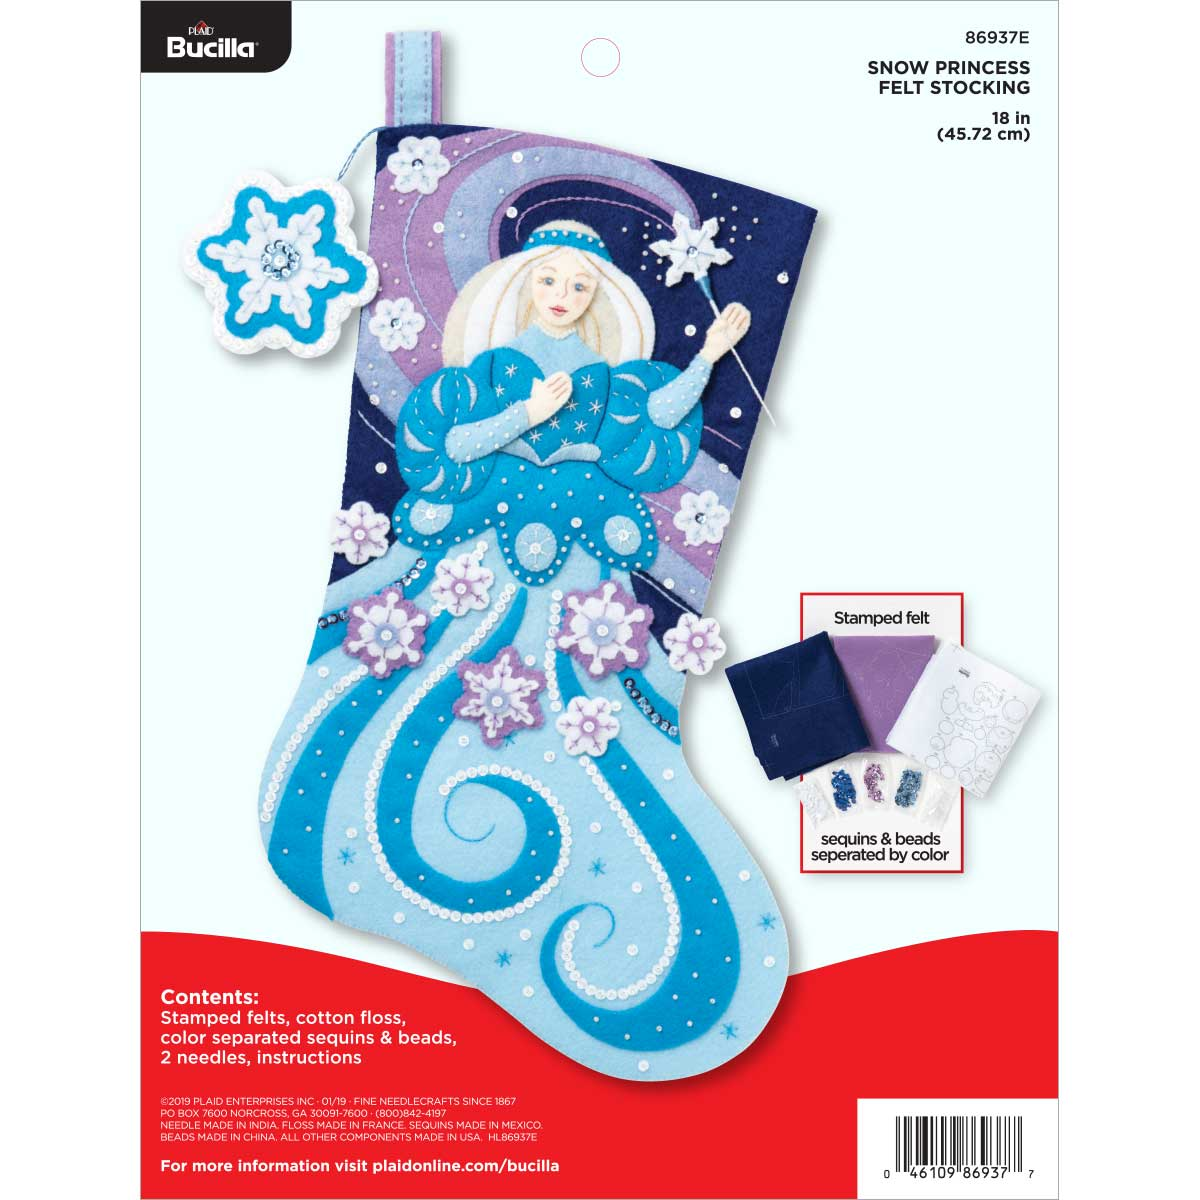 Bucilla ® Seasonal - Felt - Stocking Kits - Snow Princess